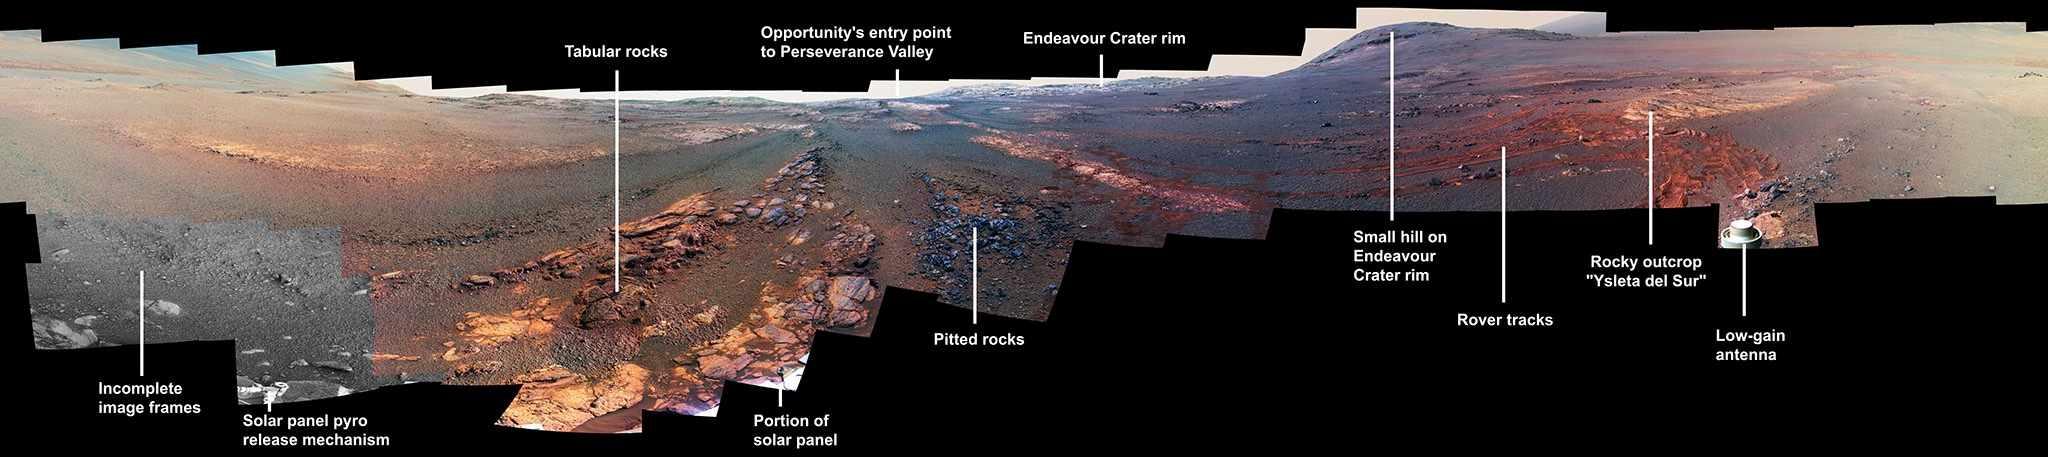 NASA Mars Exploration Rover Opportunity © NASA/JPL-Caltech/Cornell/ASU